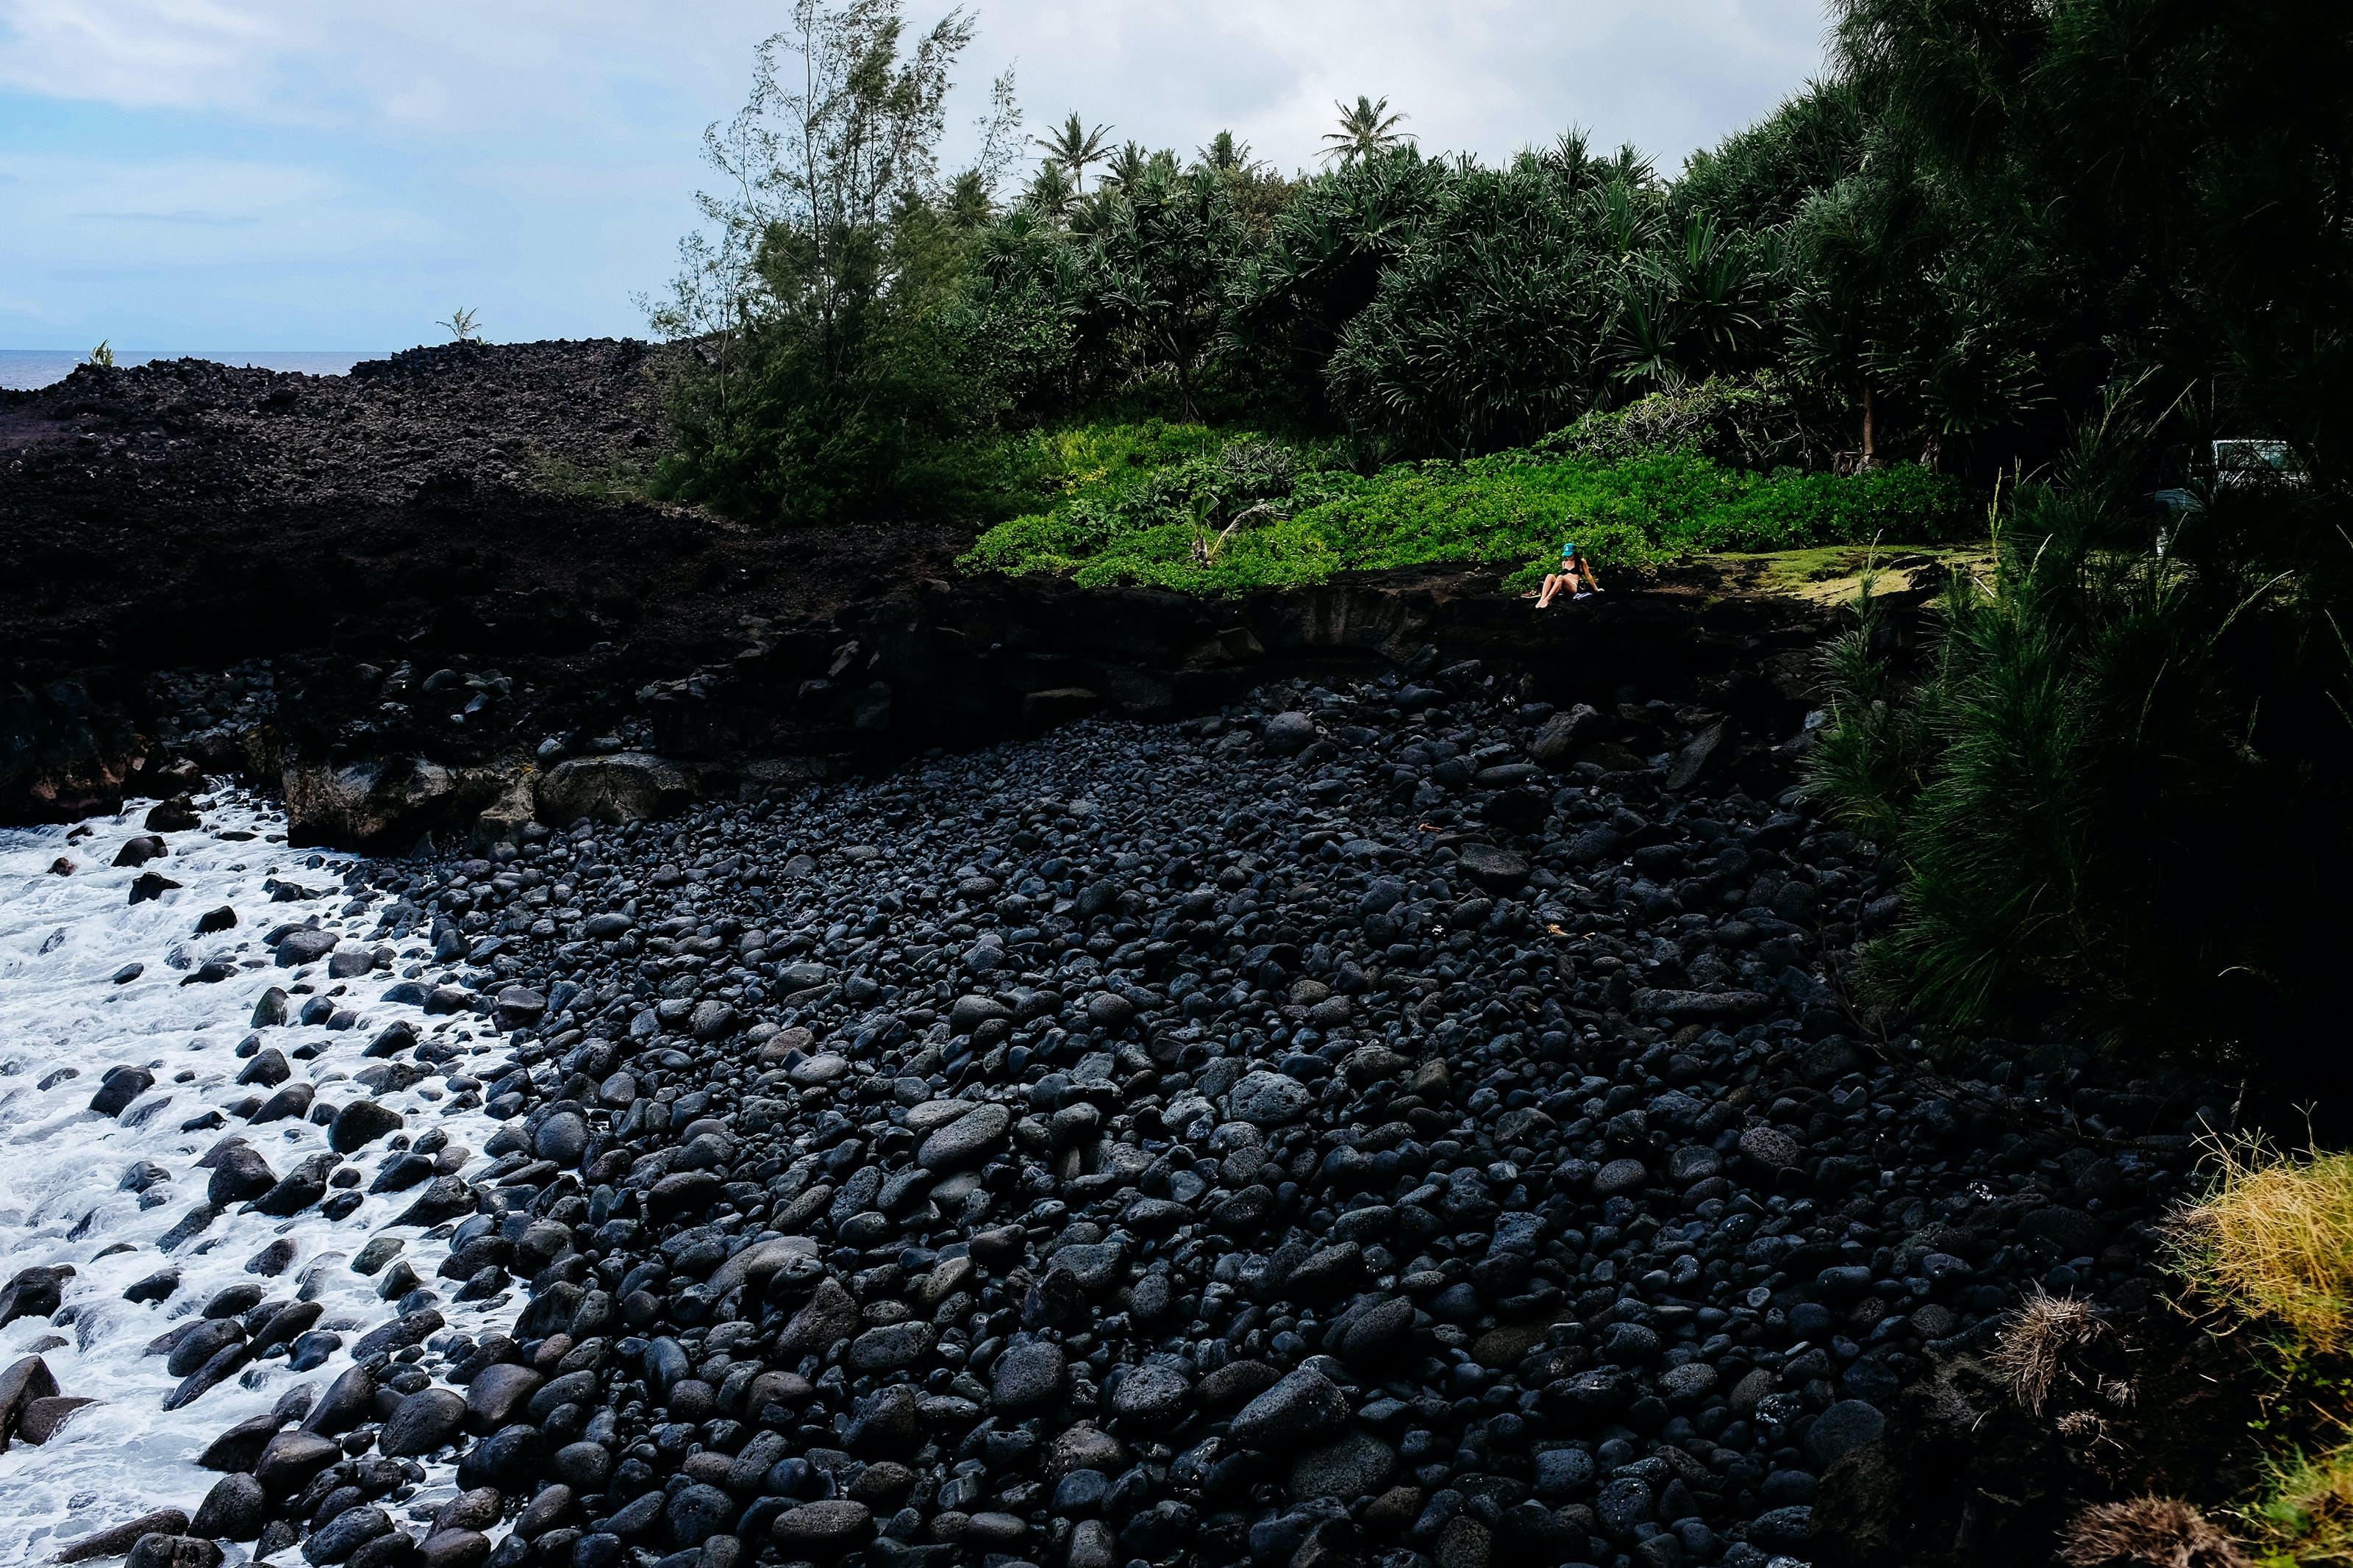 Huckberry insider's guide hawaii volcanoes national park kelsey boyte hero.jpg?ixlib=rails 2.1